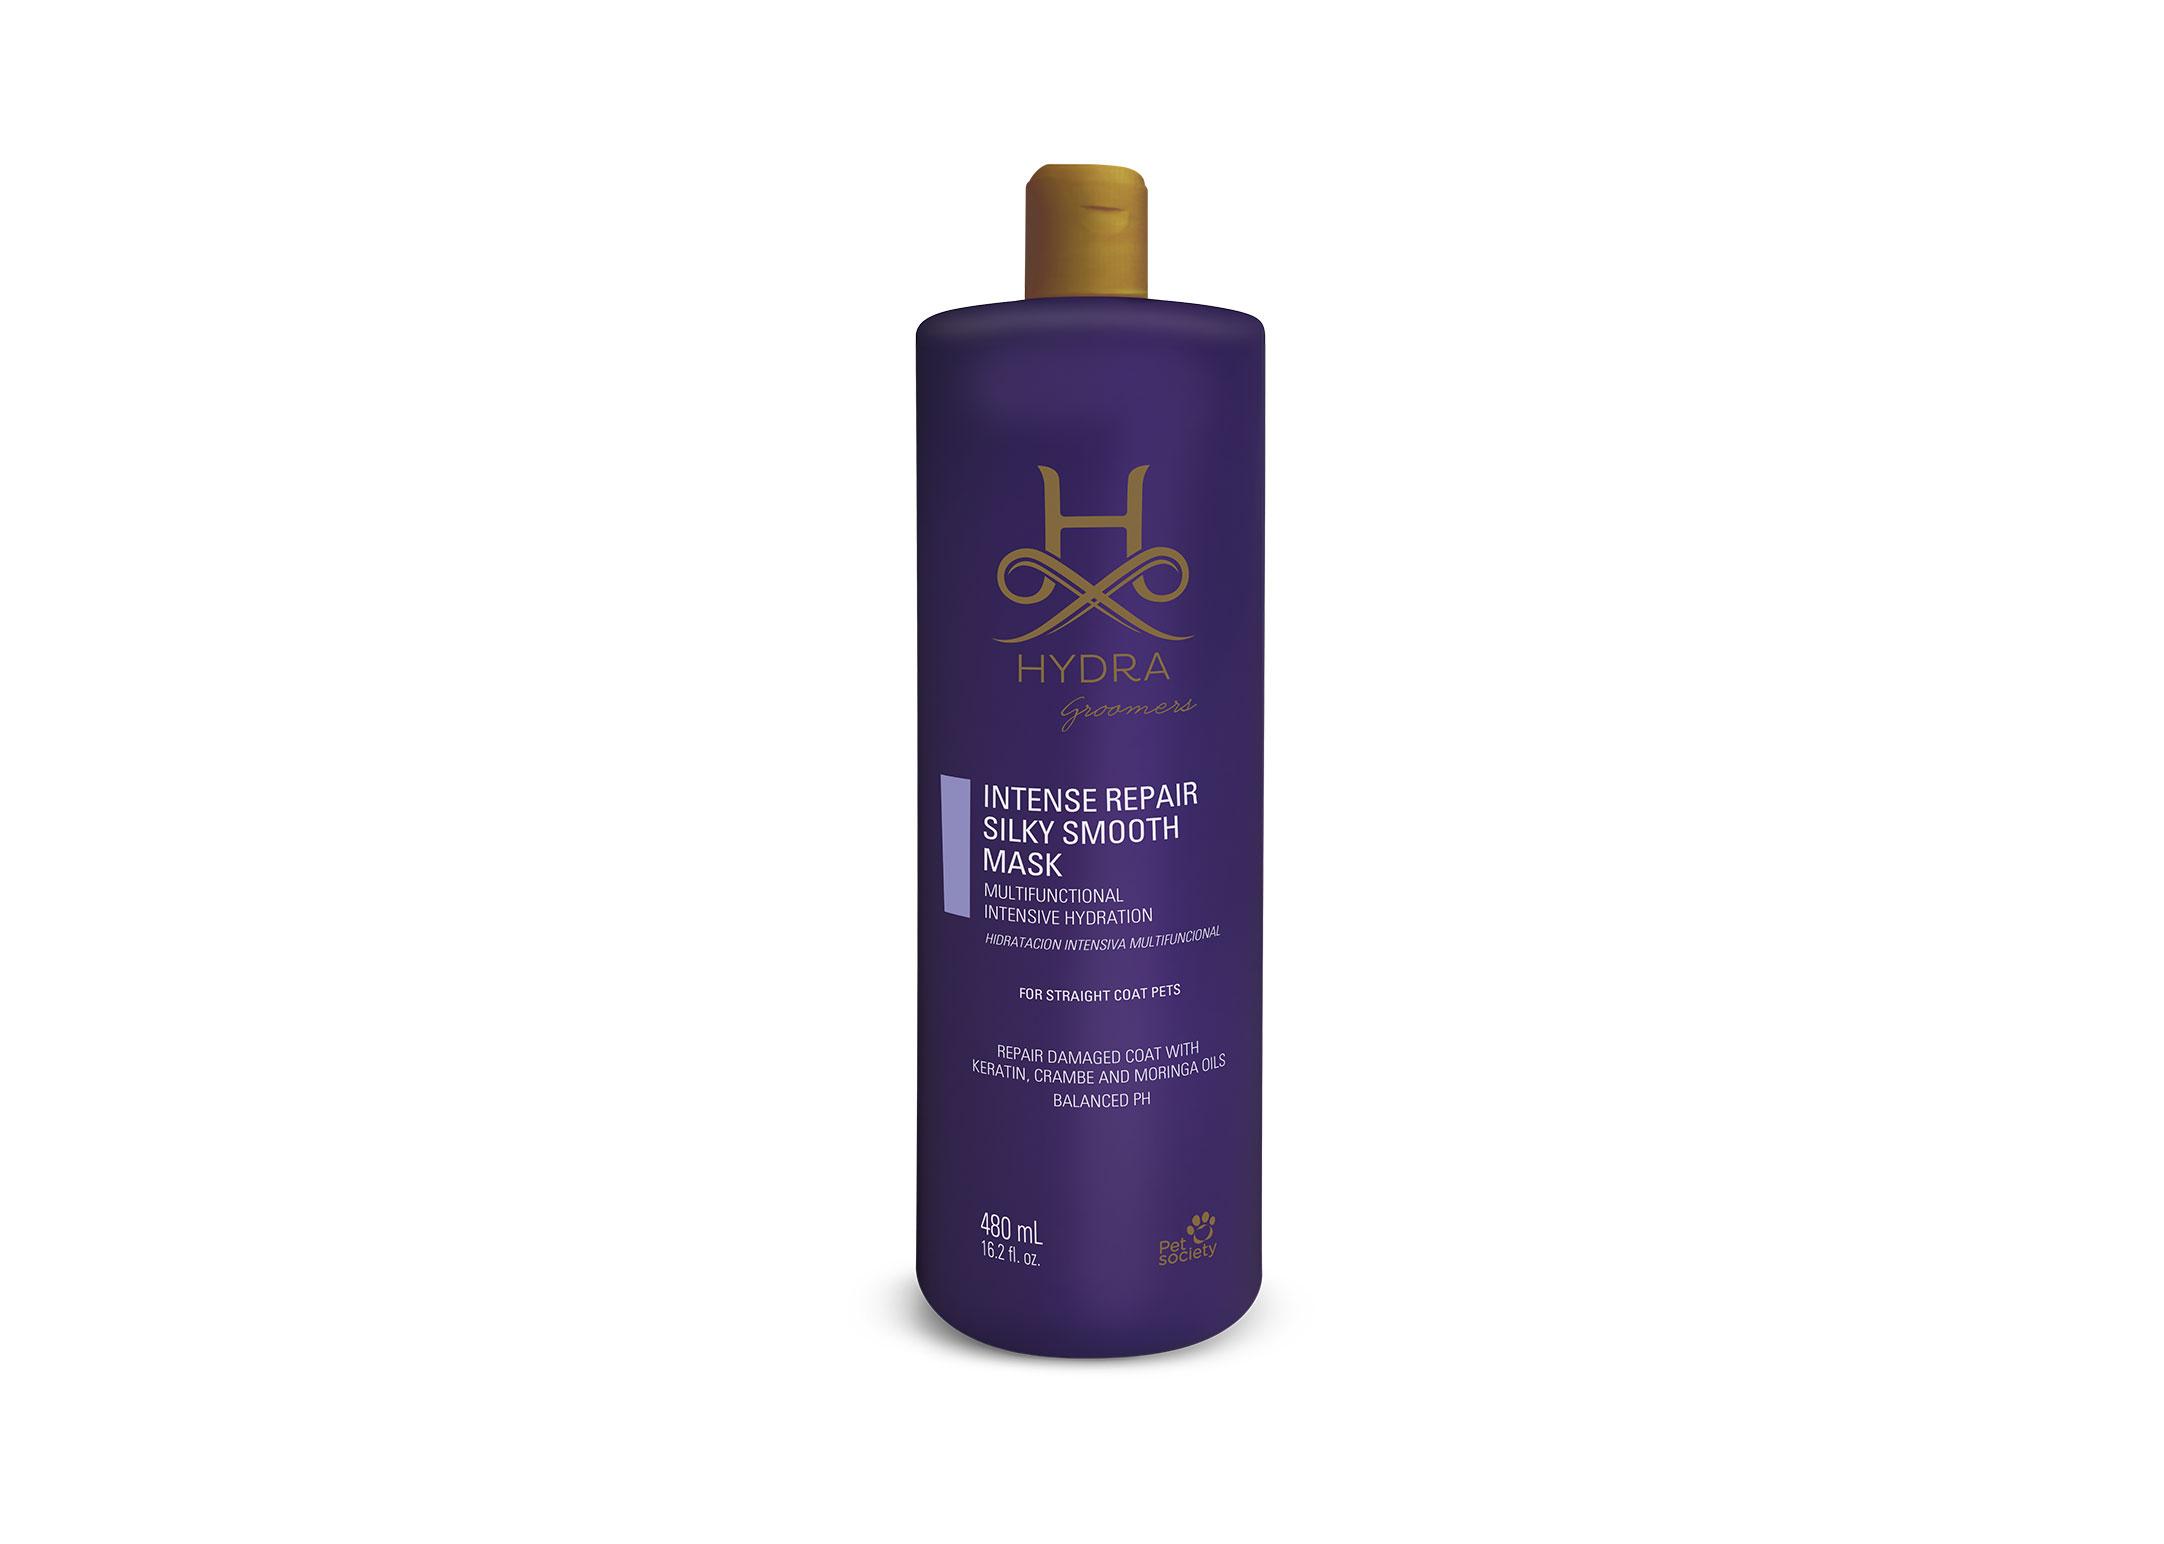 Hydra Intense Repair Silky Smooth Mask 480 ml  - masque hydratant